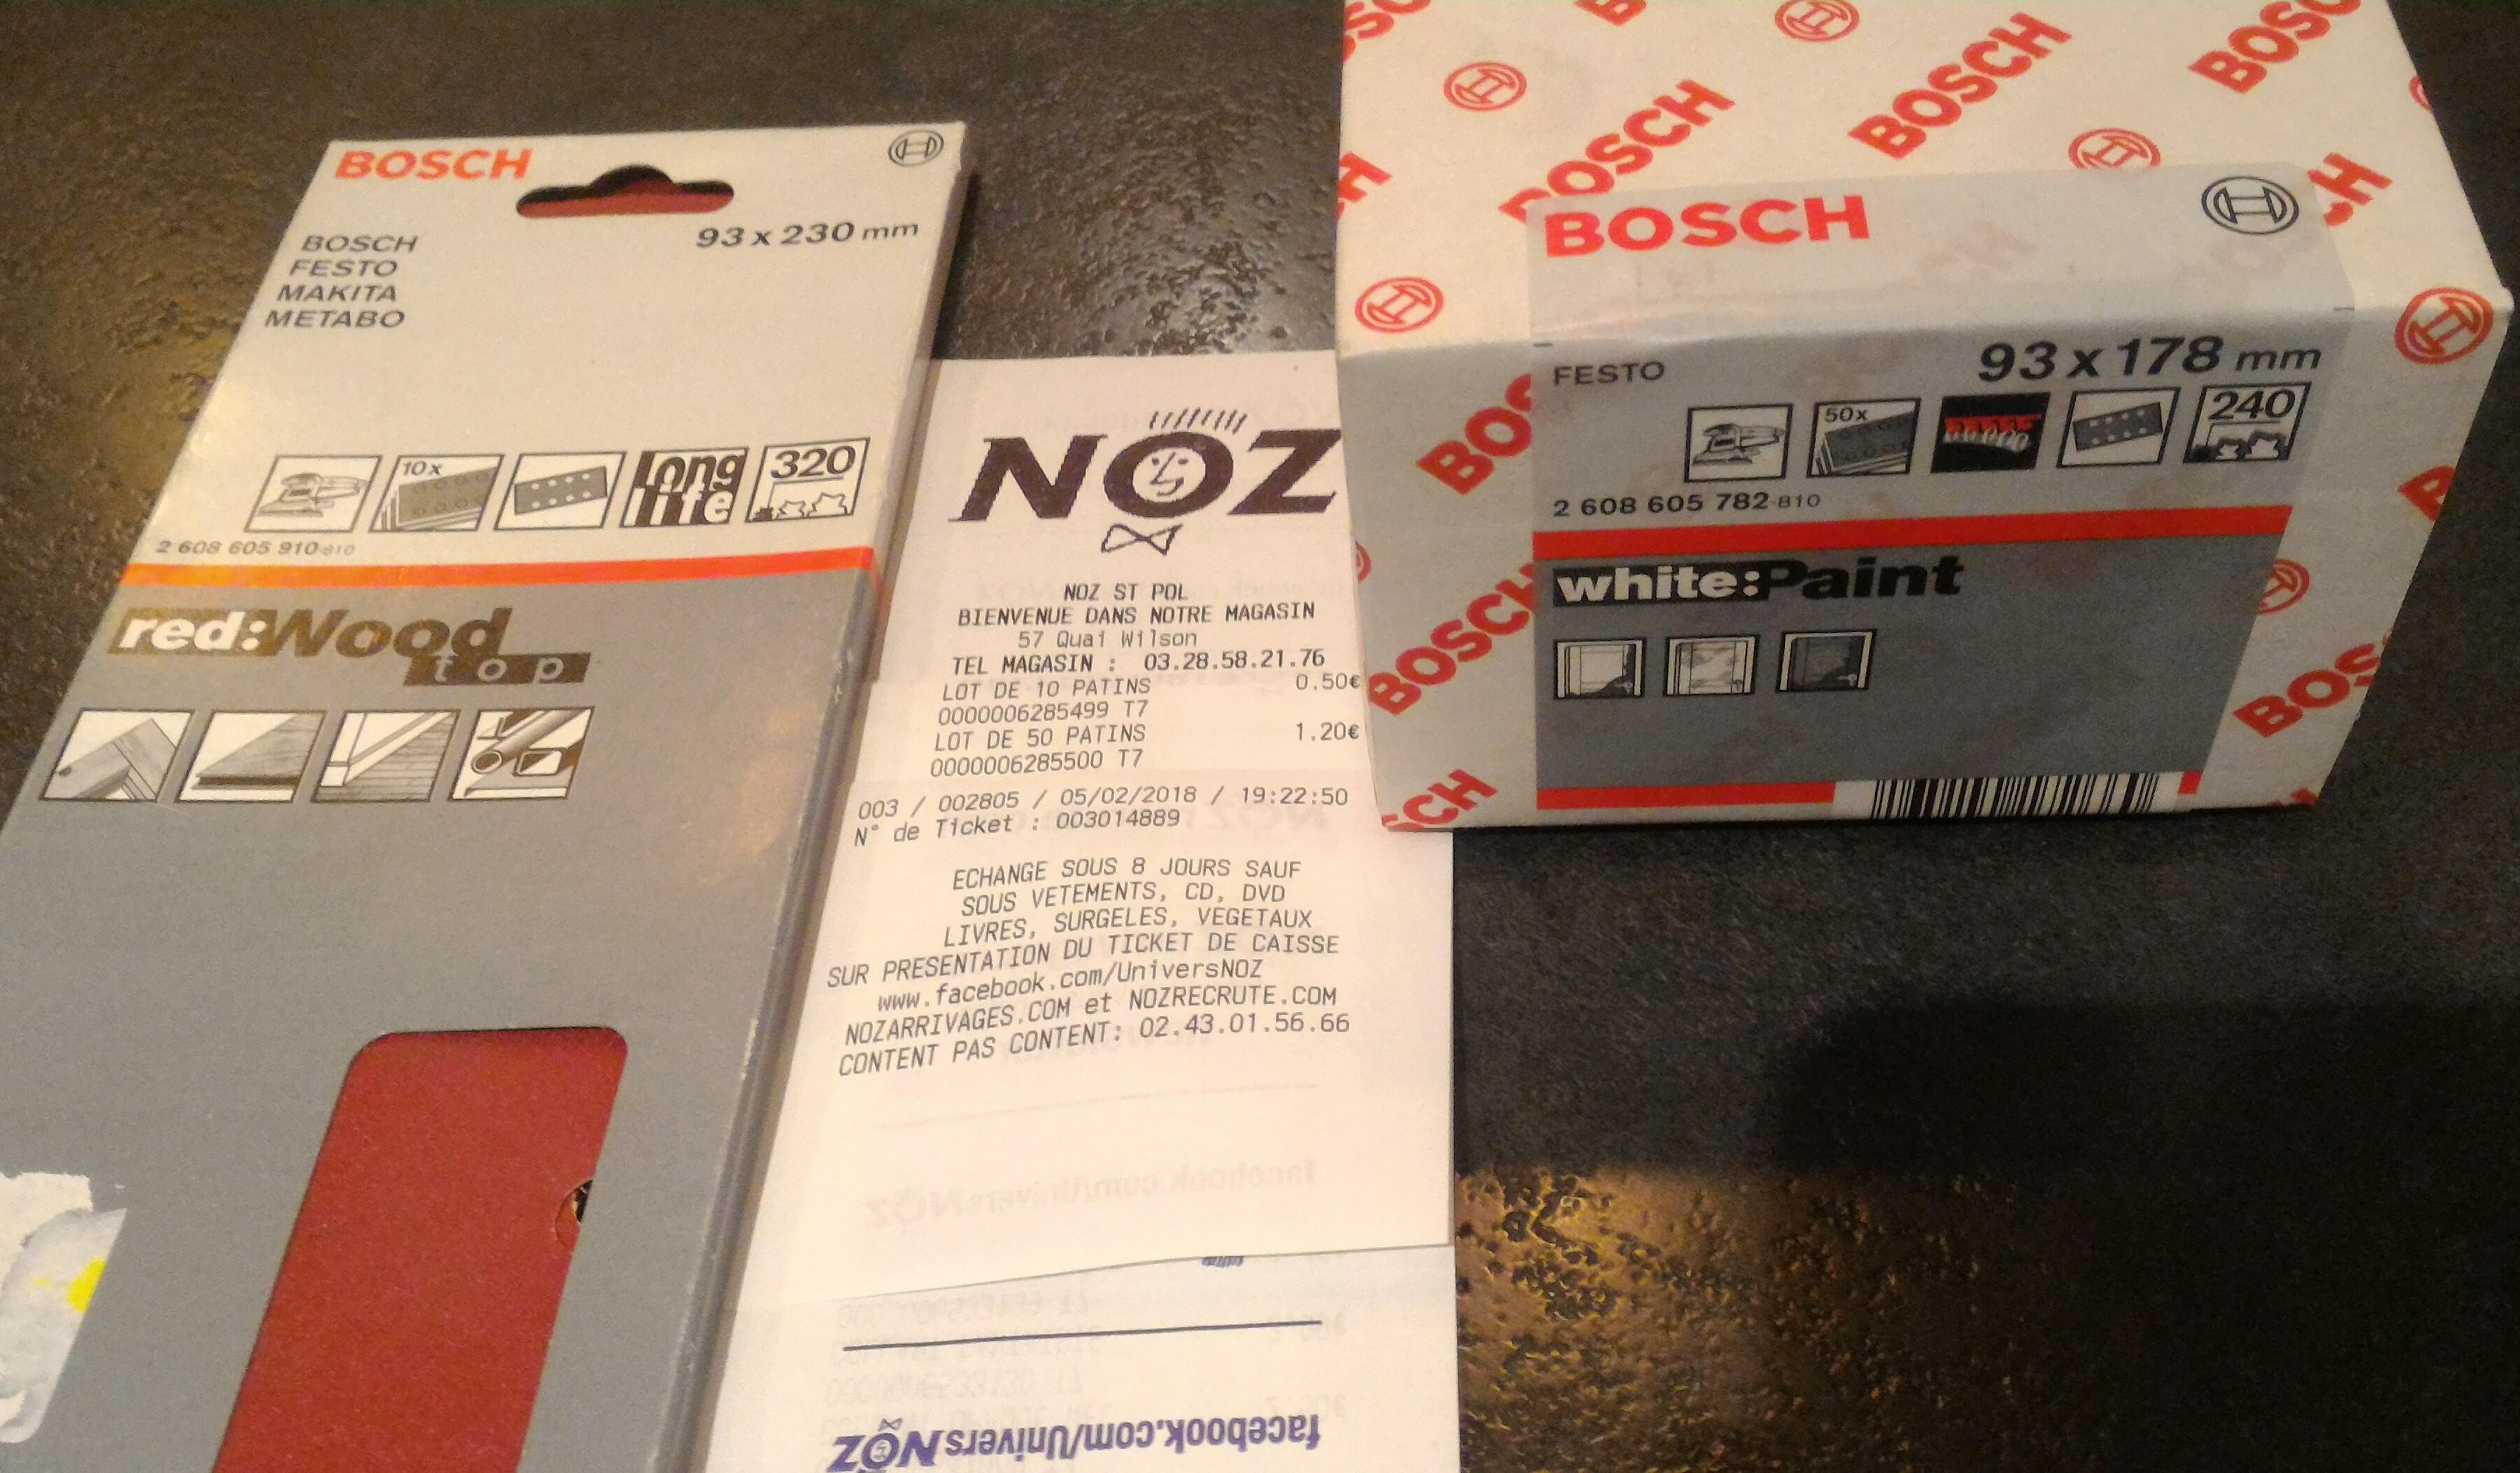 Feuilles abrasives Bosch pour ponceuse - Noz